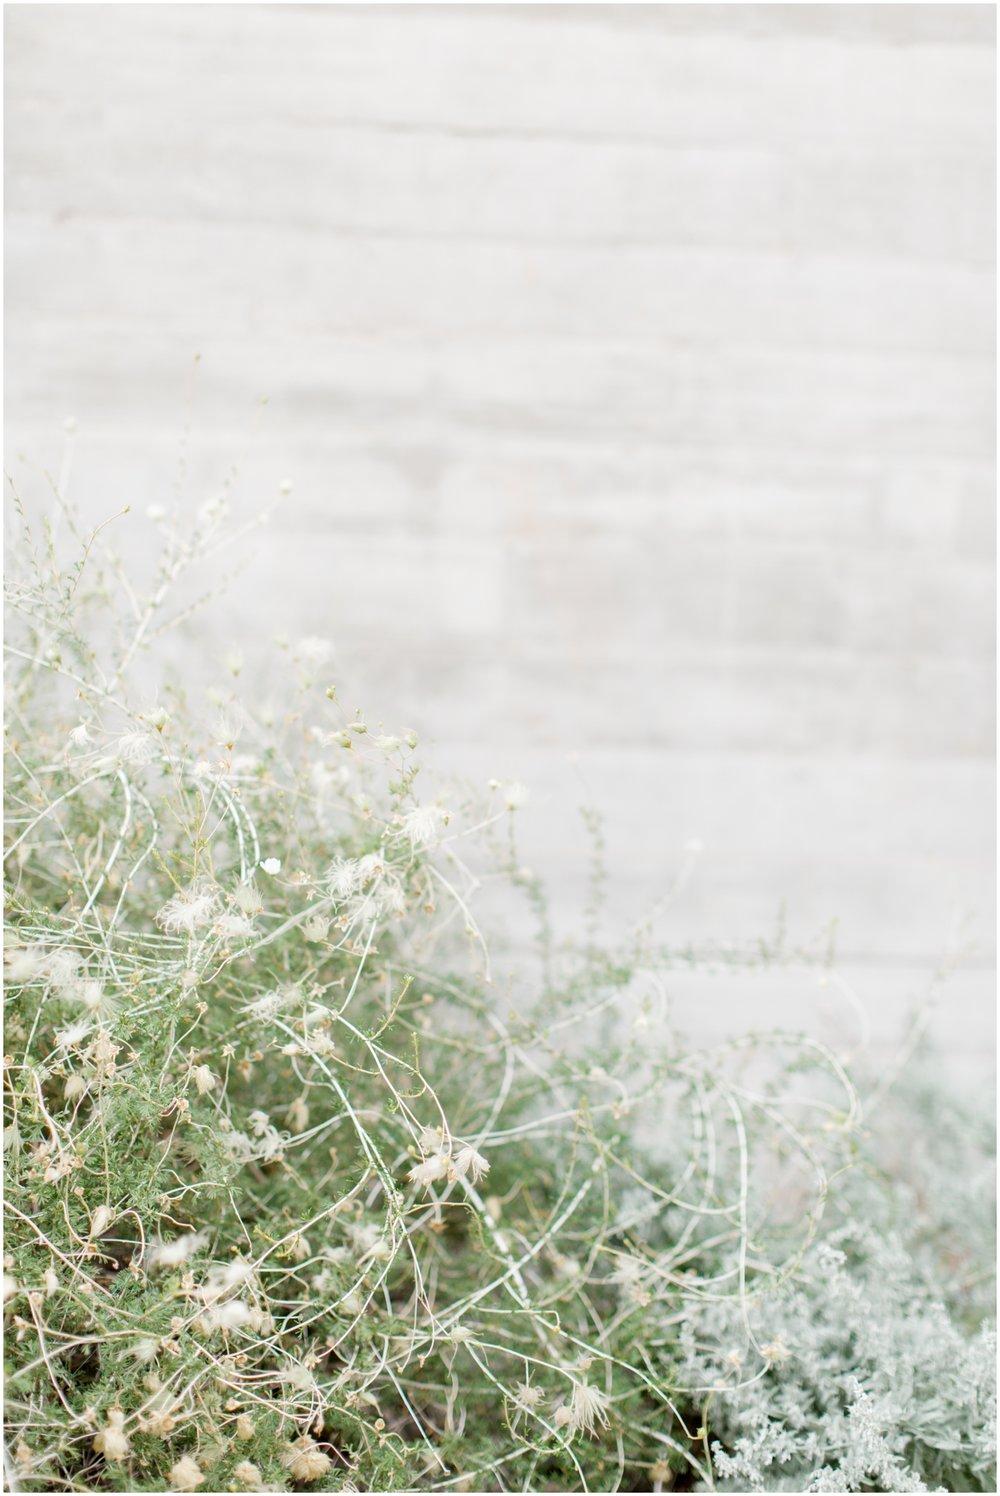 erinelizabethphoto-443.jpg